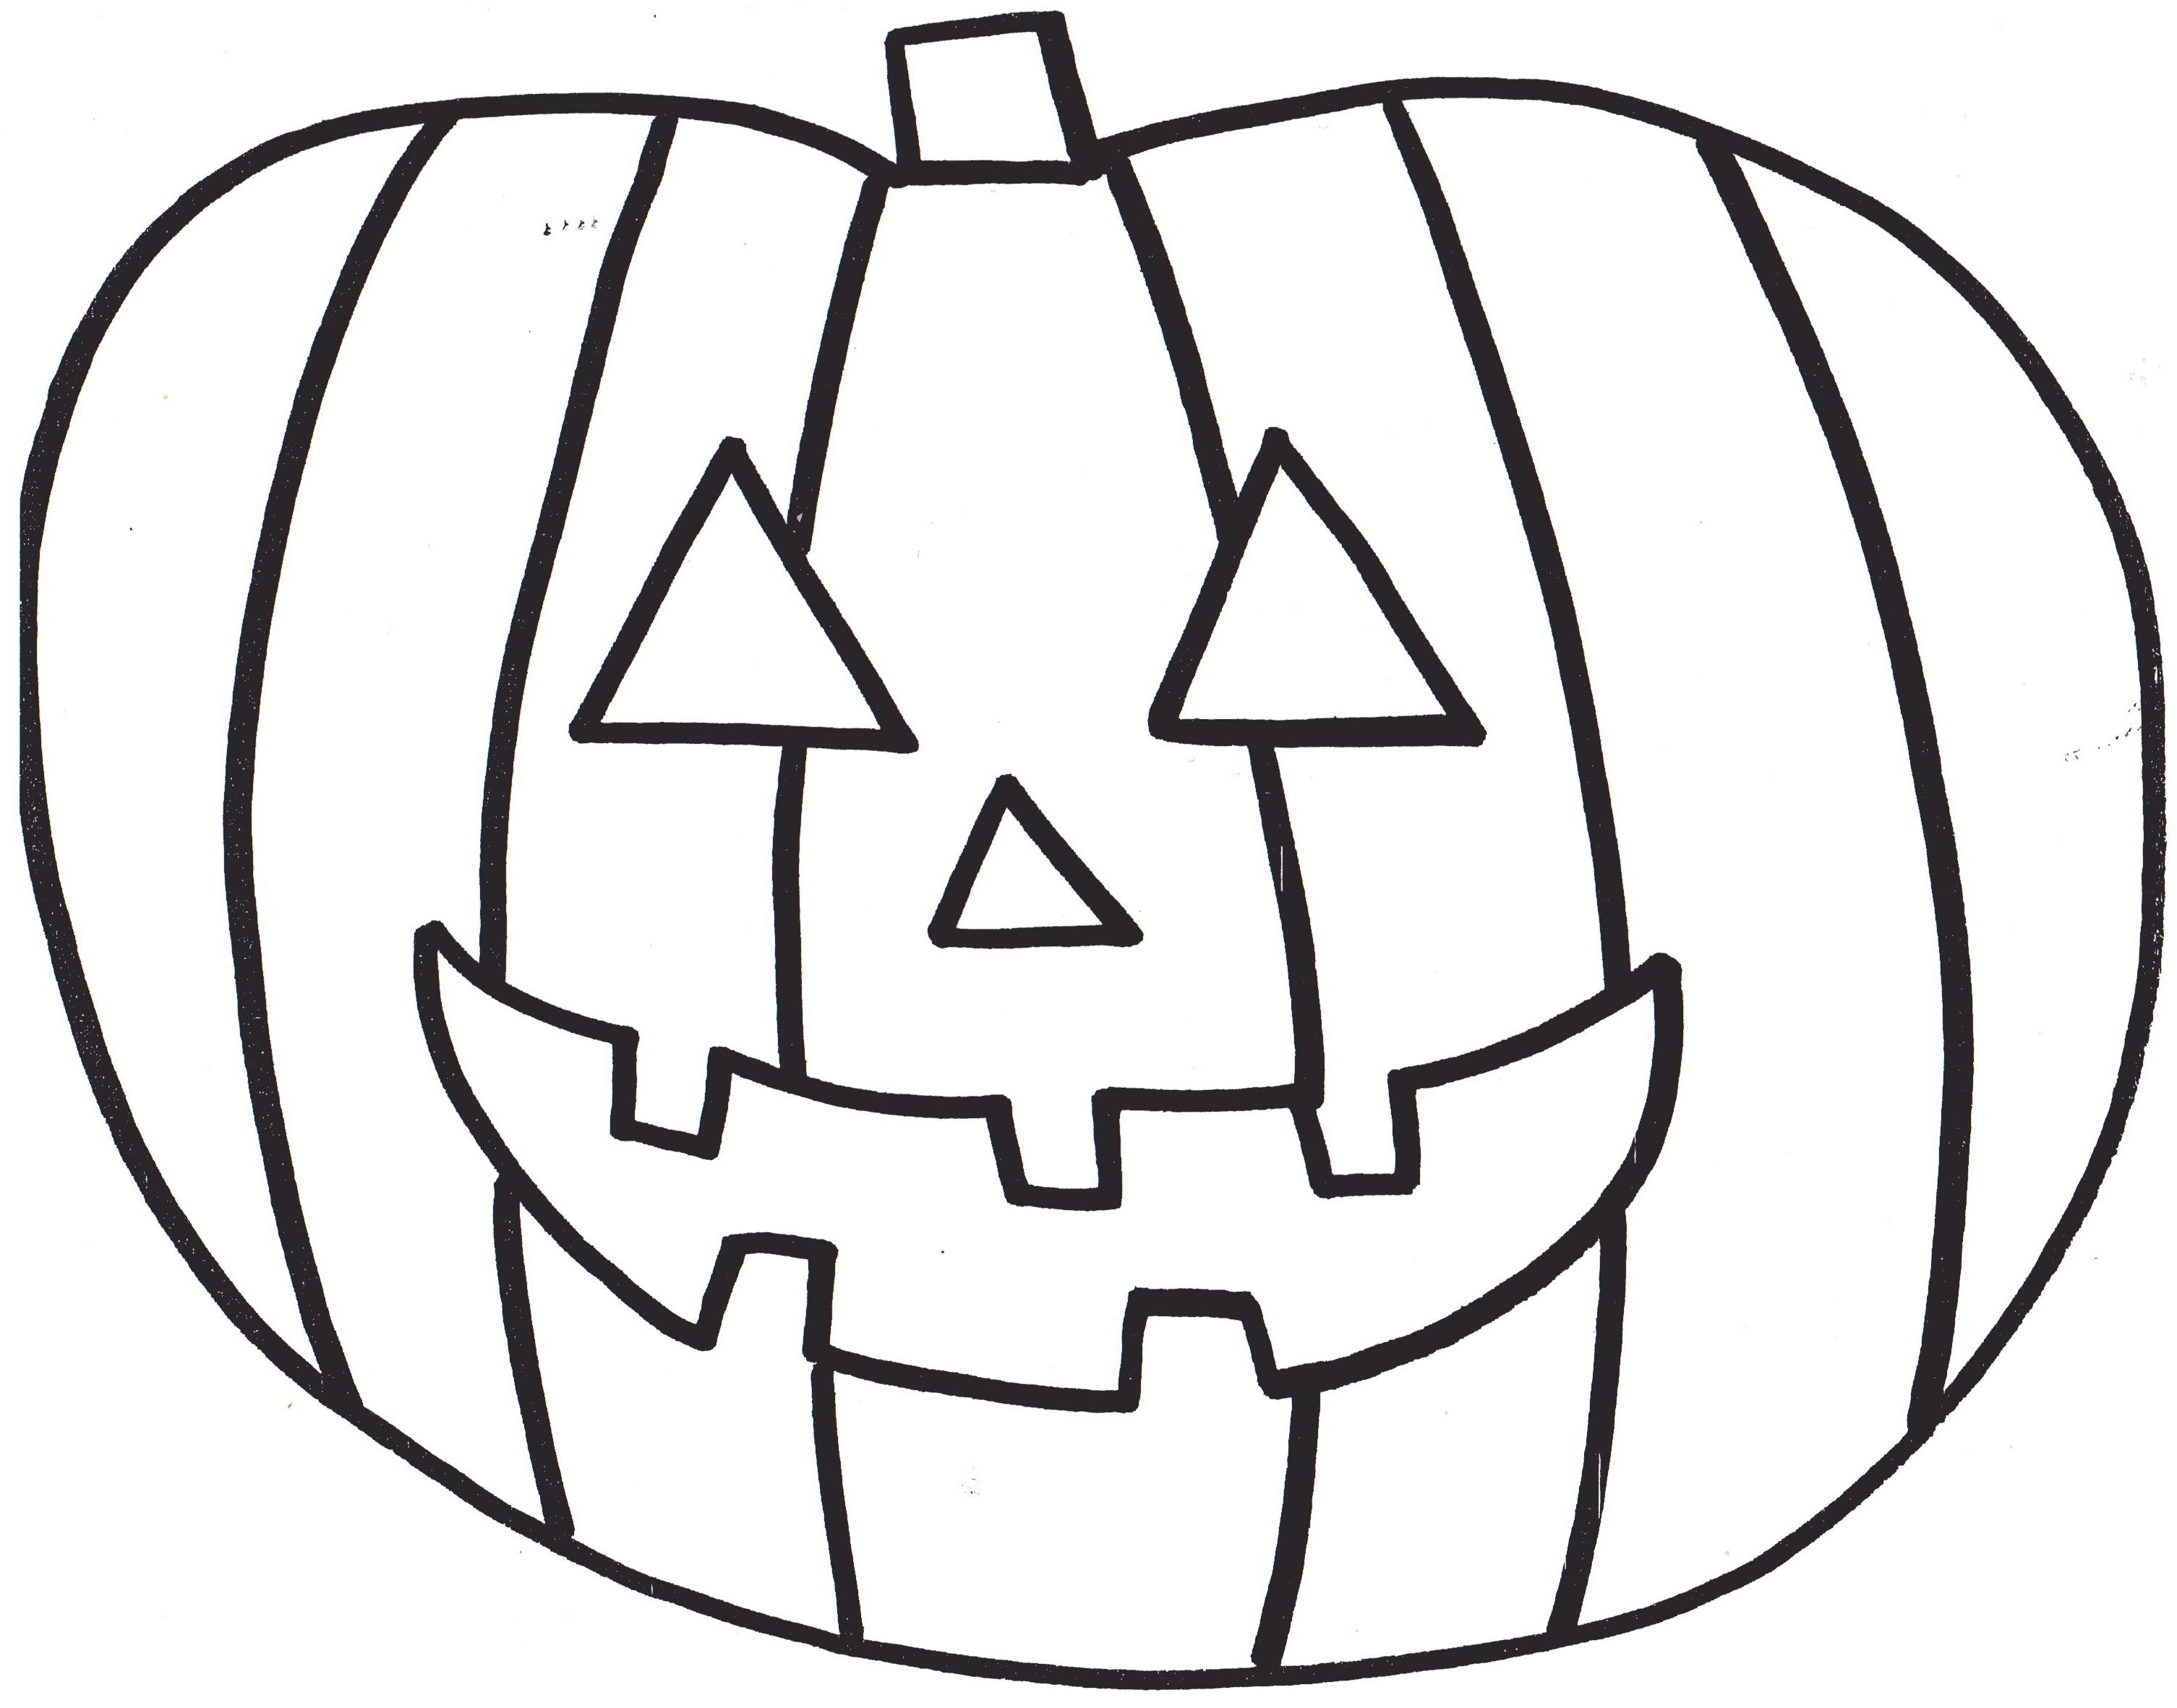 Halloween Pumpkin Coloring Pages Printables Pretentious Design Coloring Pages Of Pumpkins Unique Collection